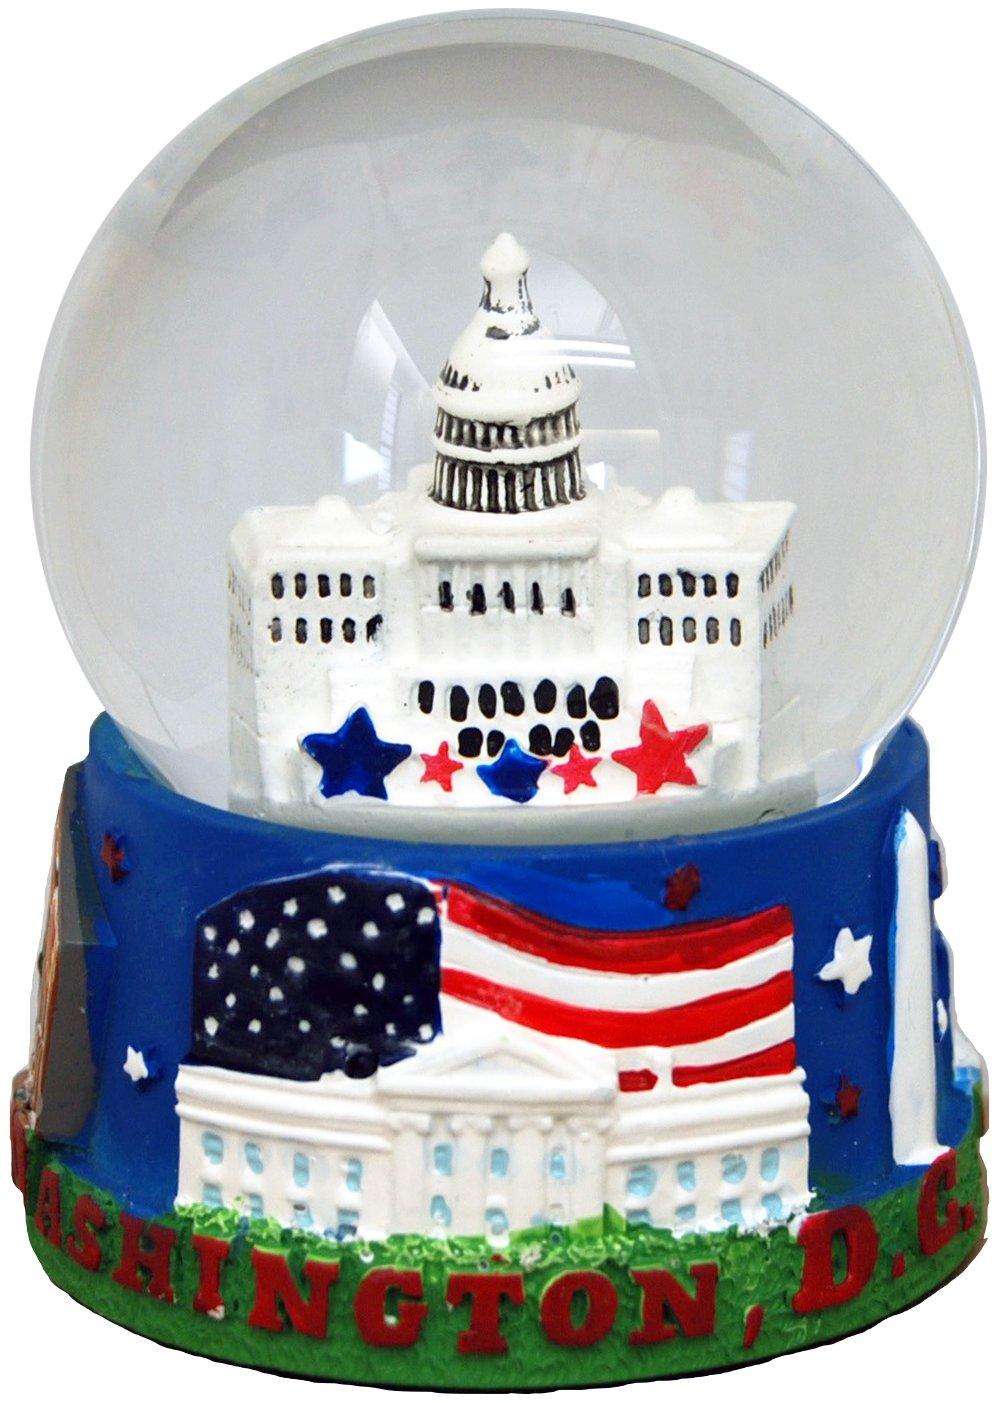 CityDreamShop Patriotic White House Large Souvenir Snow Globe Featuring Washington D.C The American Flag